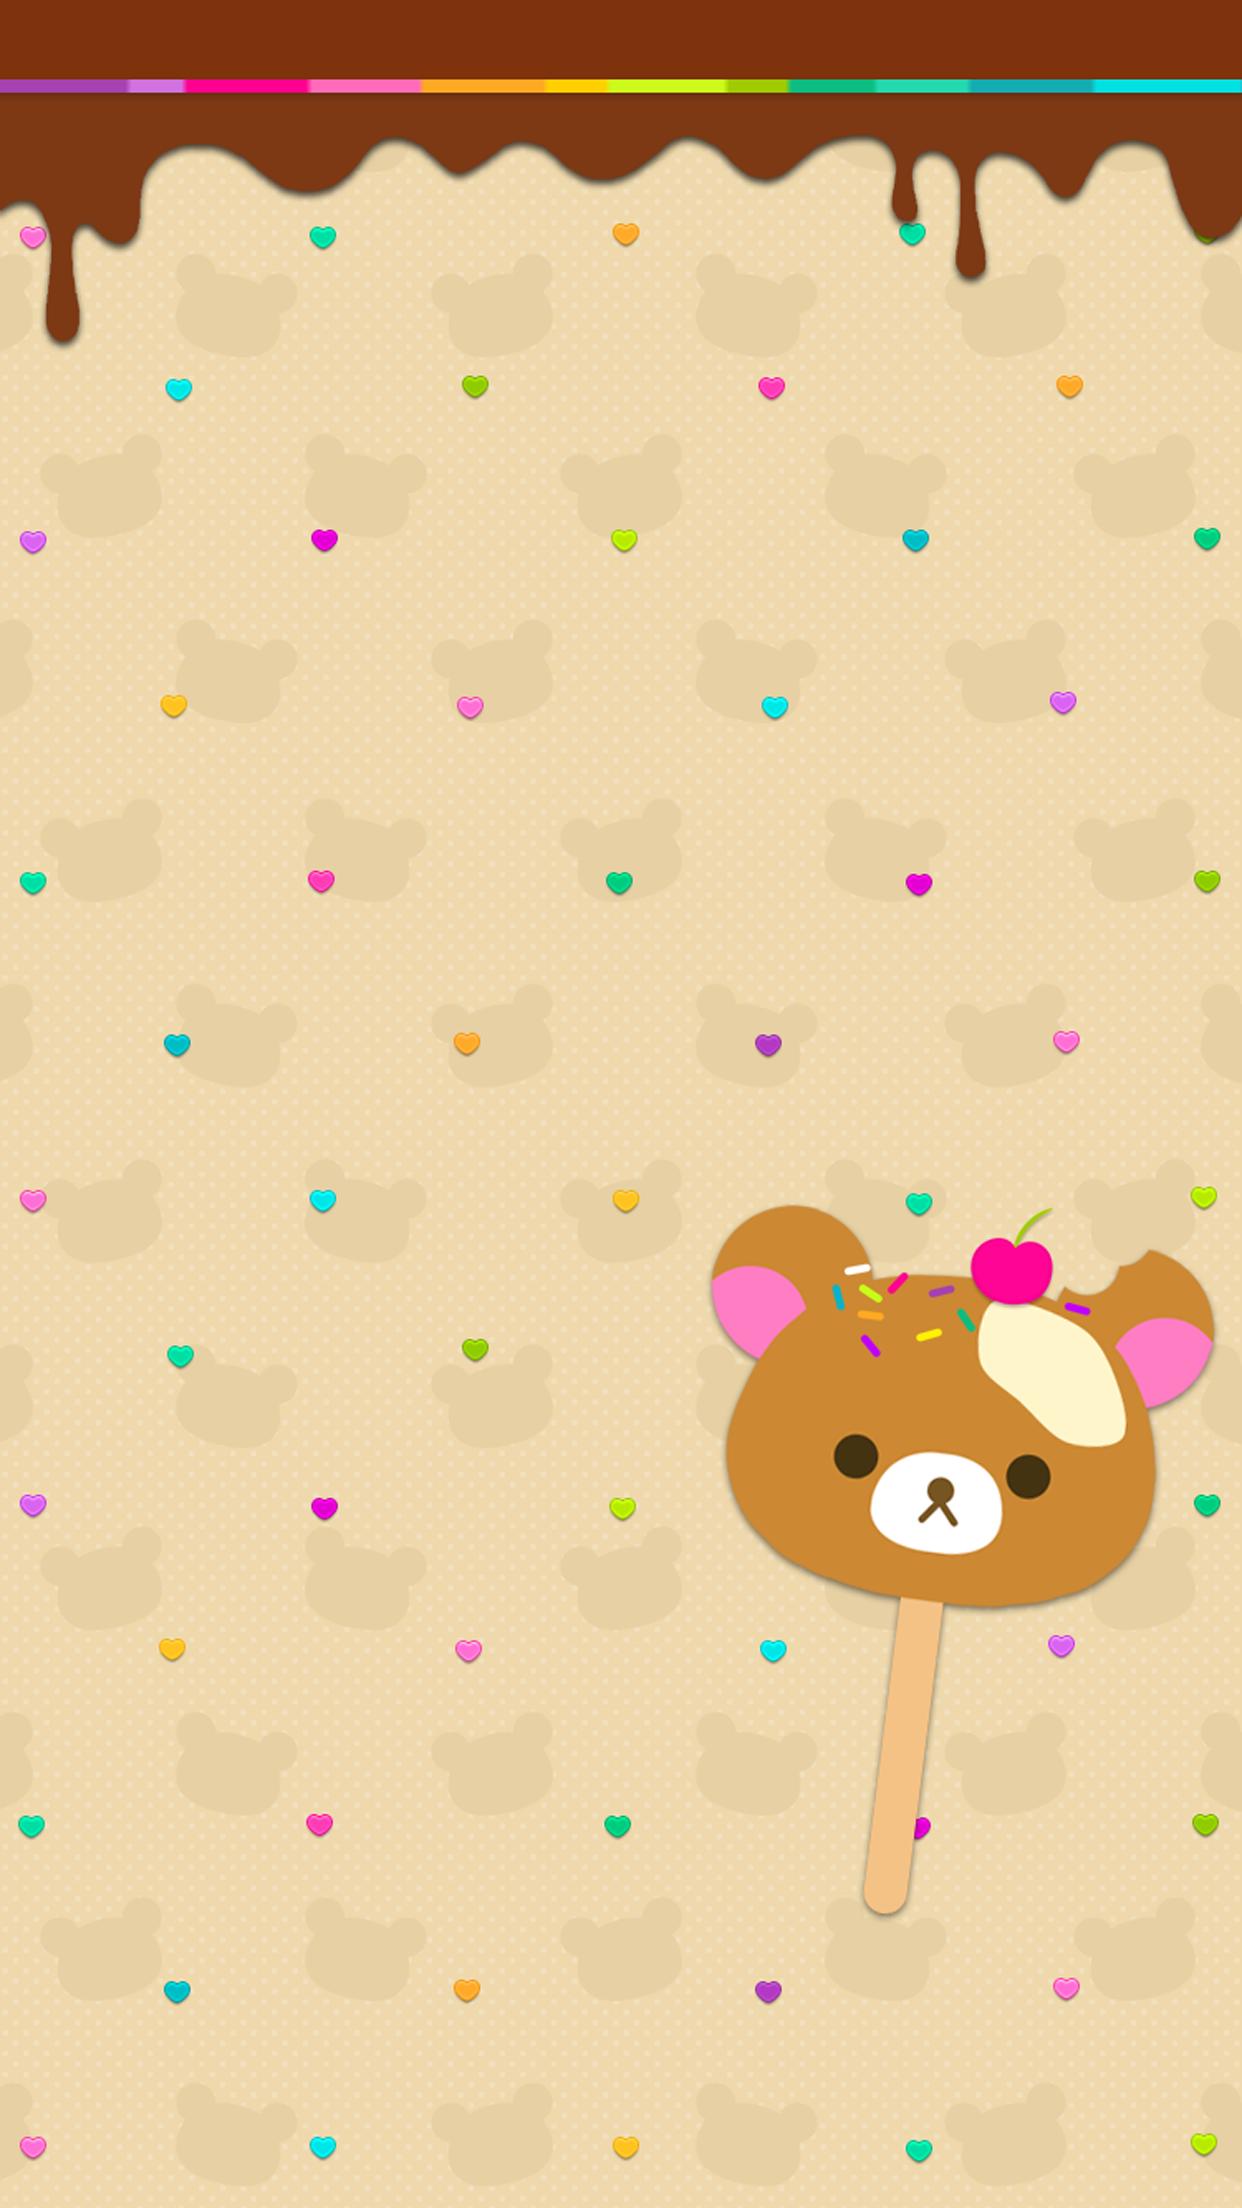 Fantastic Wallpaper Hello Kitty Bear - f4102b36e343d4d3f47711fdcb02910b  Snapshot_69932.png